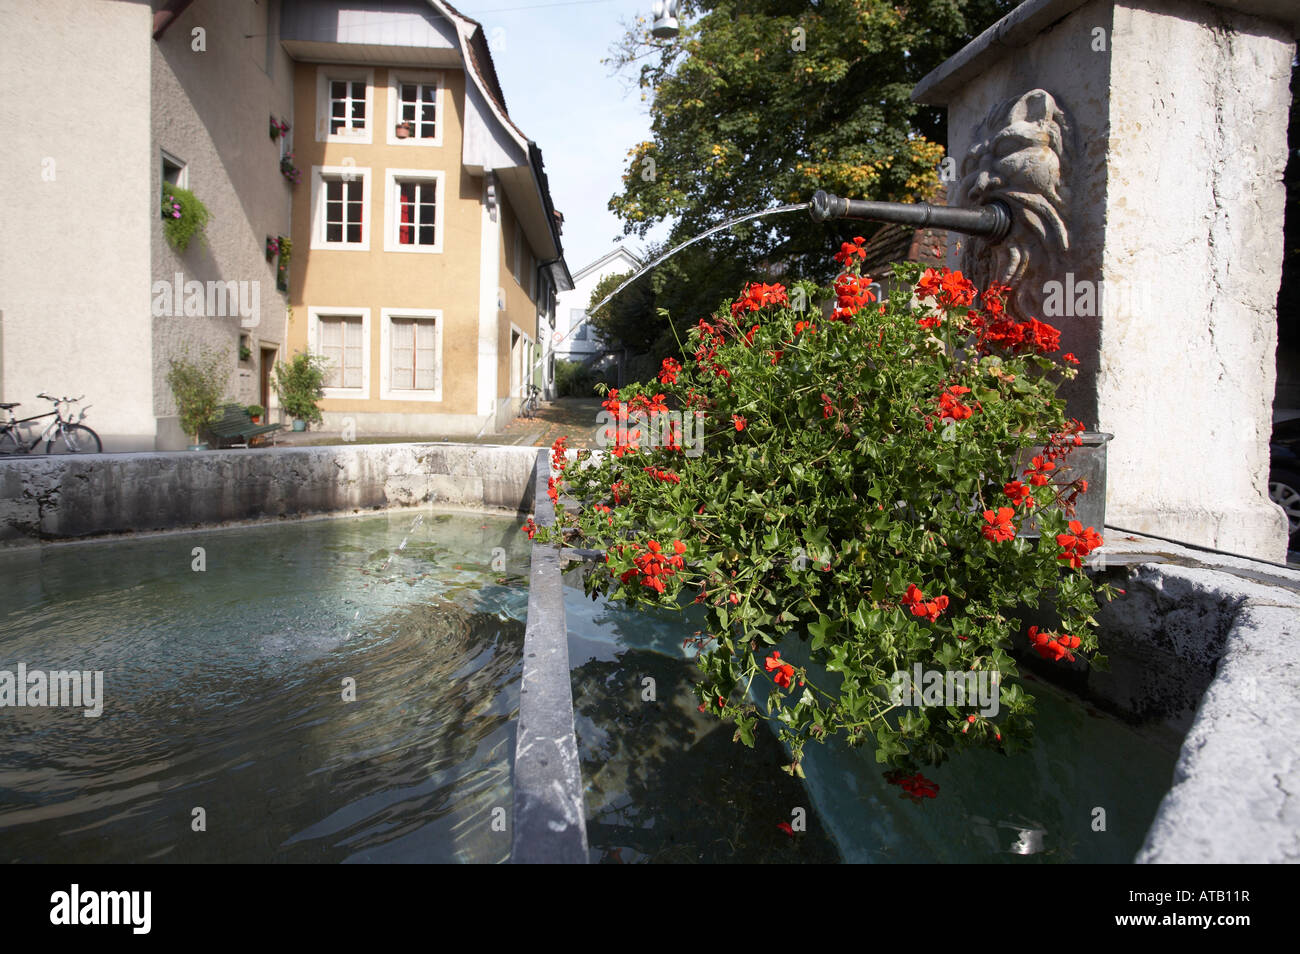 Letzigasse Fountain, Zofingen, Switzerland - Stock Image